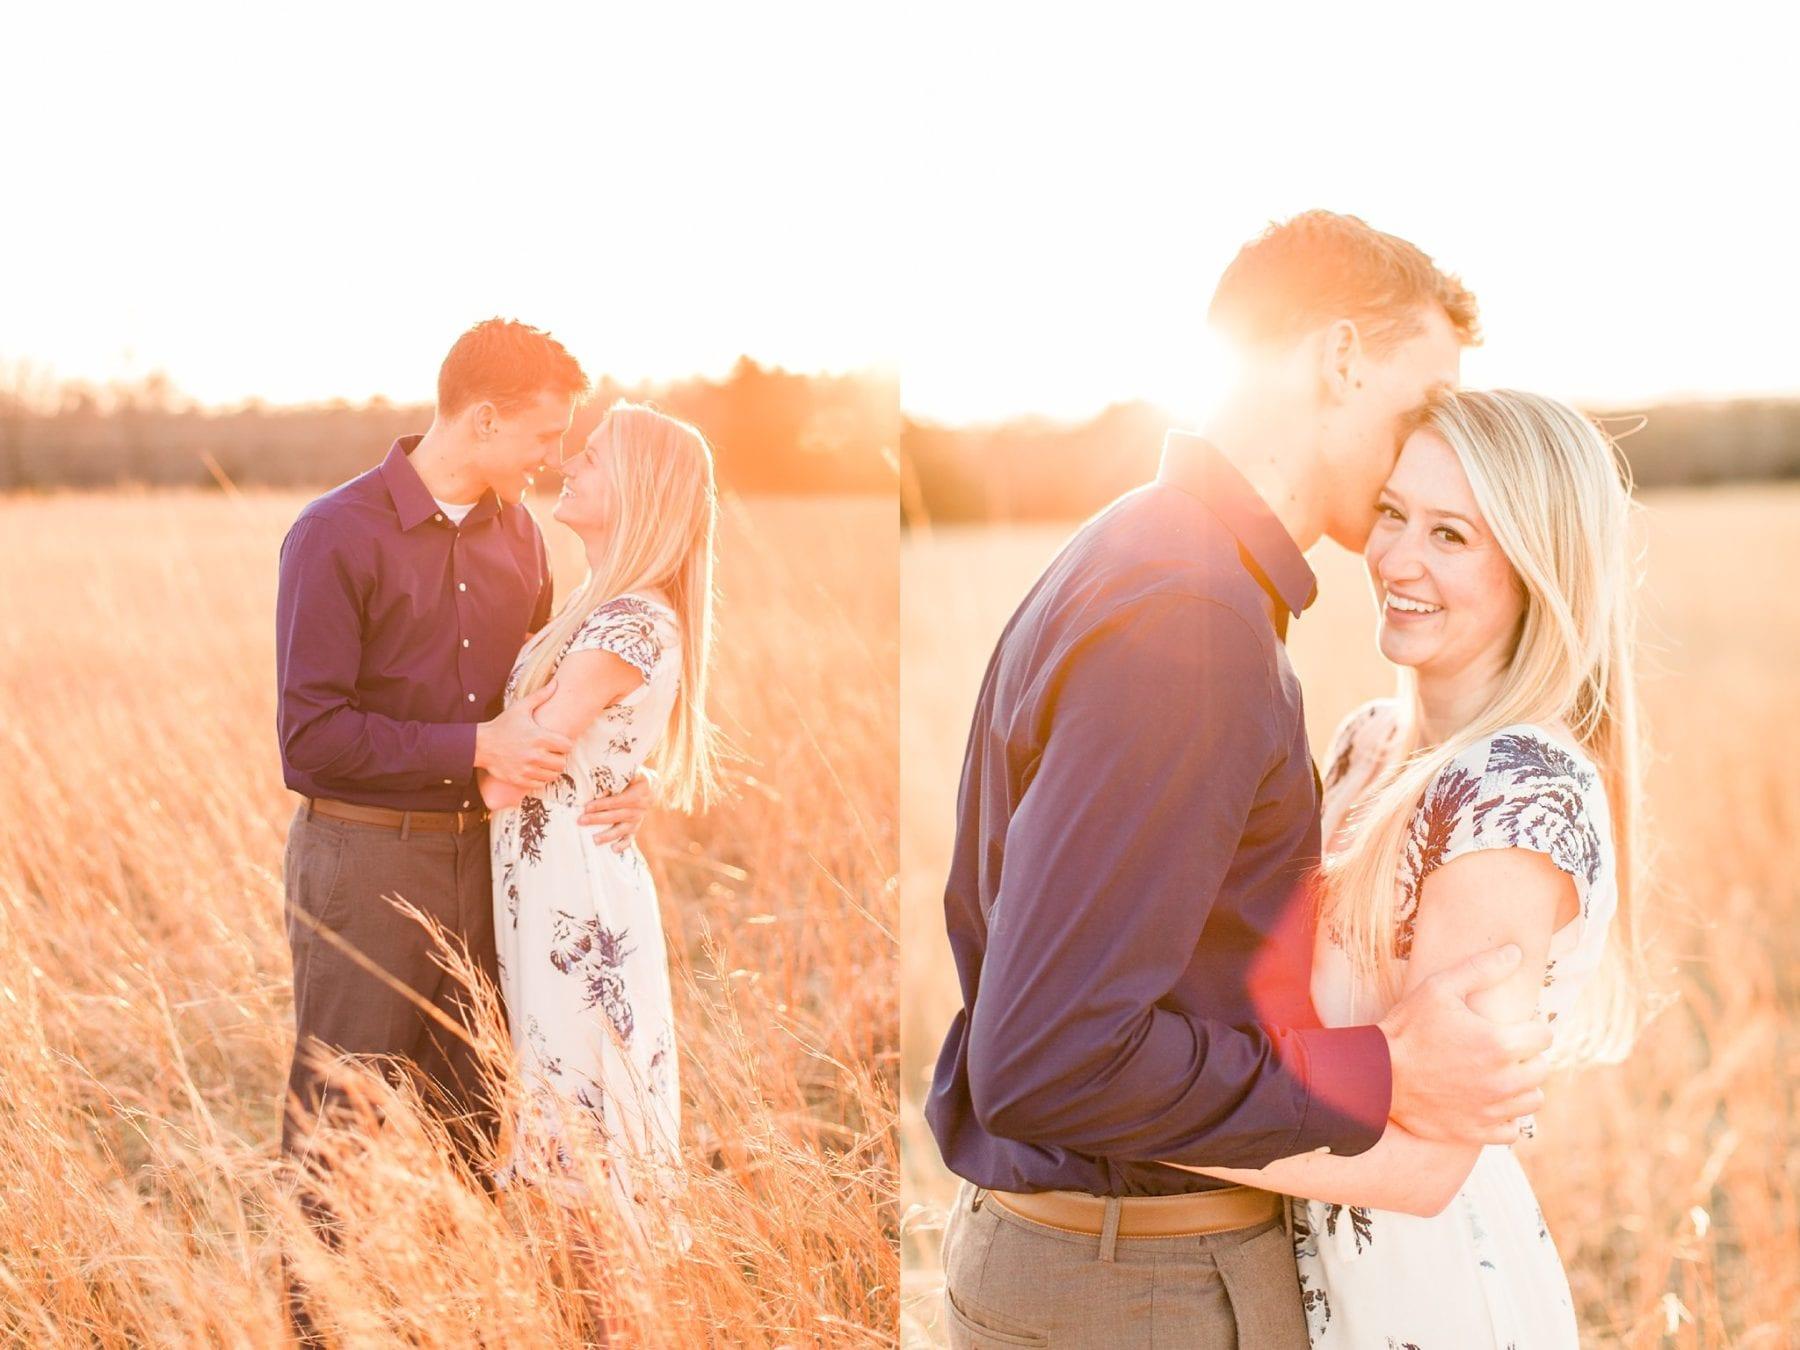 Manassas Battlefield Engagement Session Virginia Wedding Photographer Danielle & Charlie Megan Kelsey Photography-6070.jpg